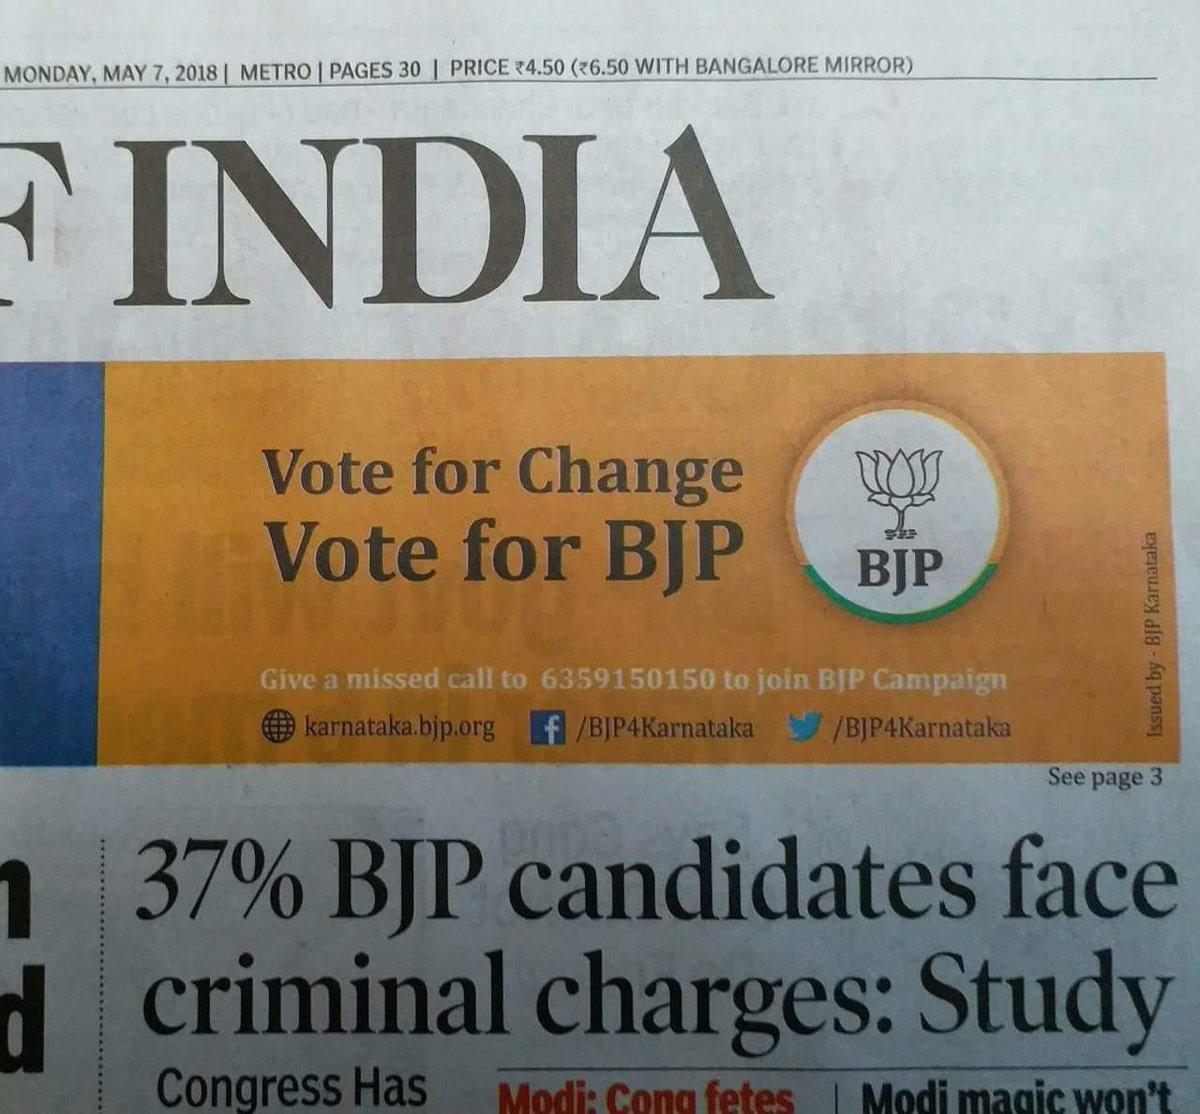 timesofindianewspaper